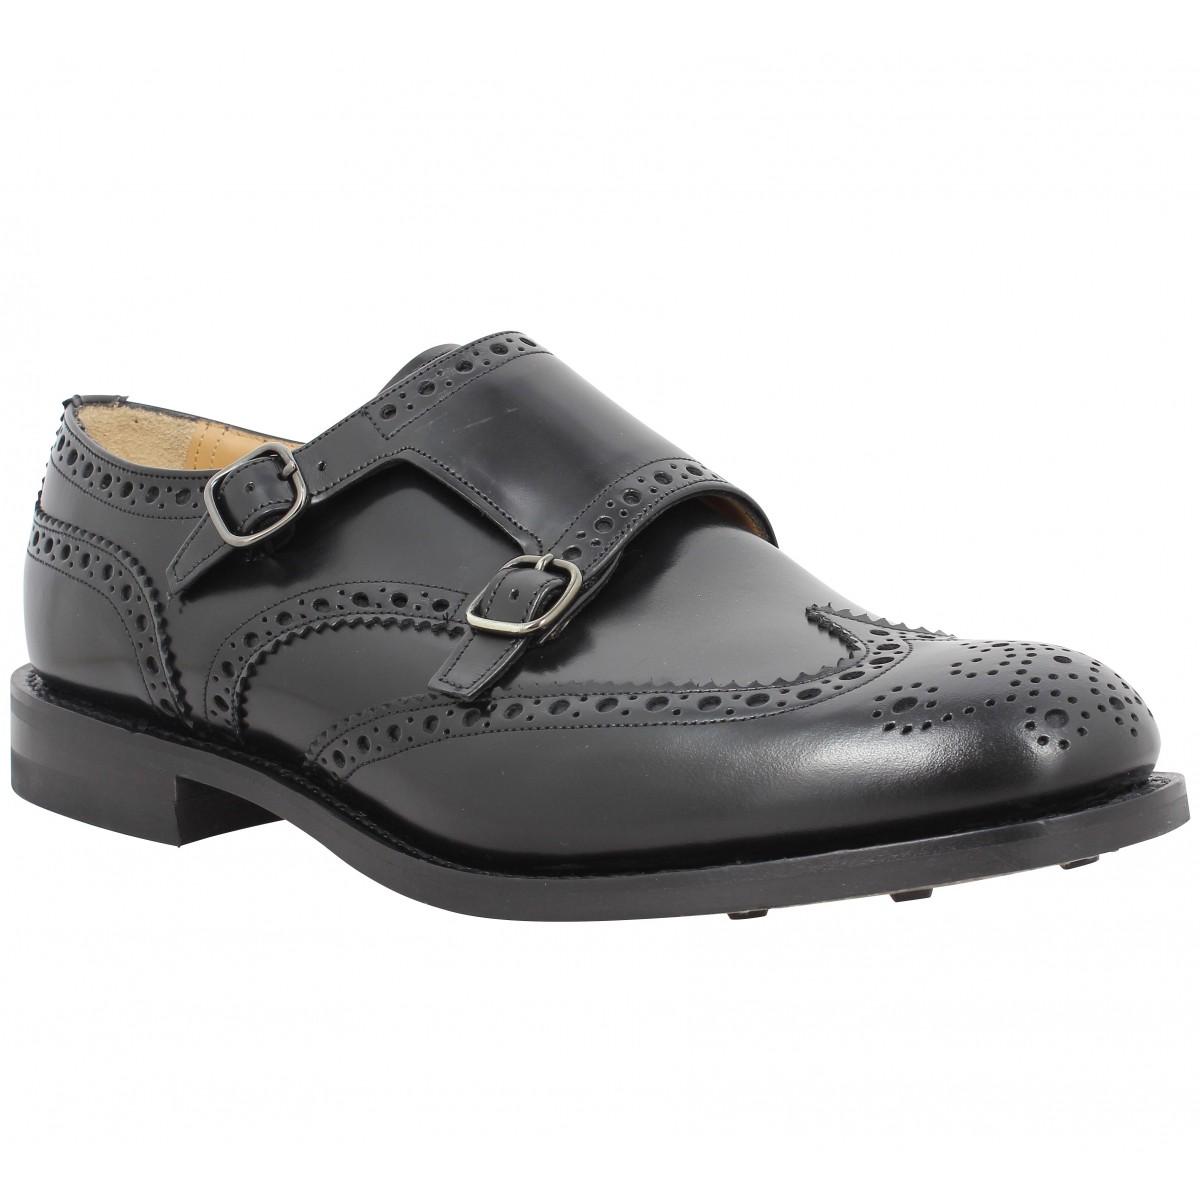 Chaussures à lacets CHURCH'S Seaforth cuir Homme Noir